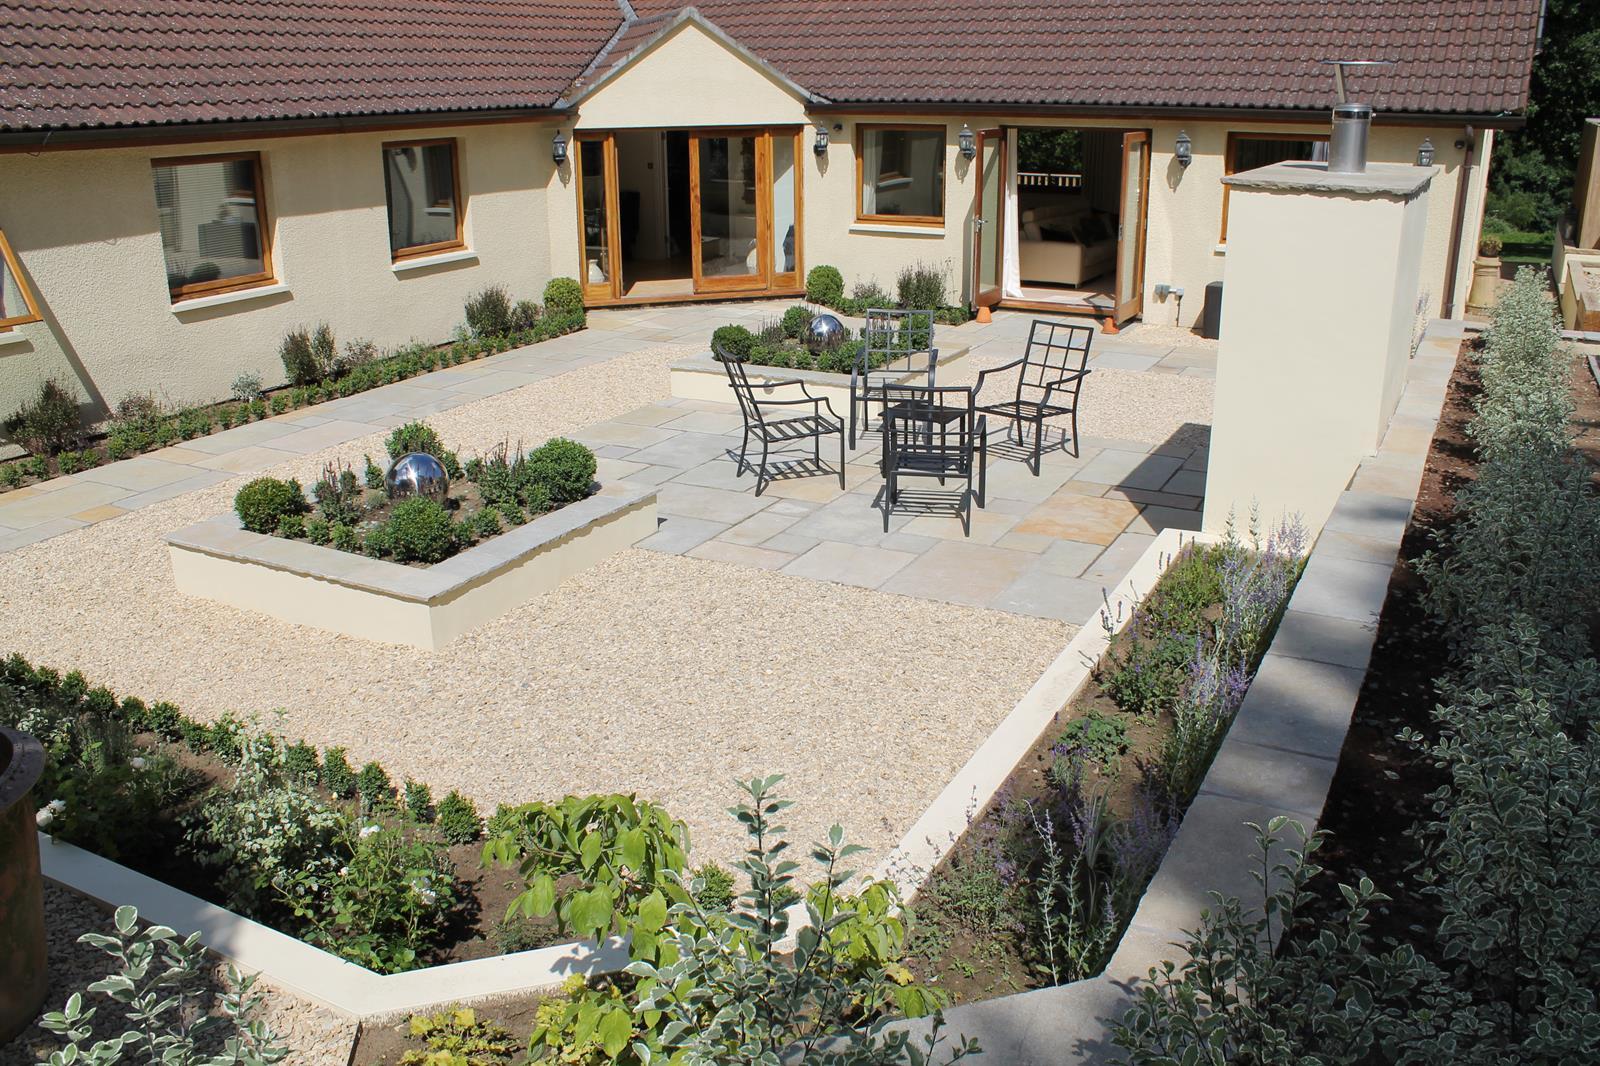 Sunken courtyard garden outerspace for Outer space gardens